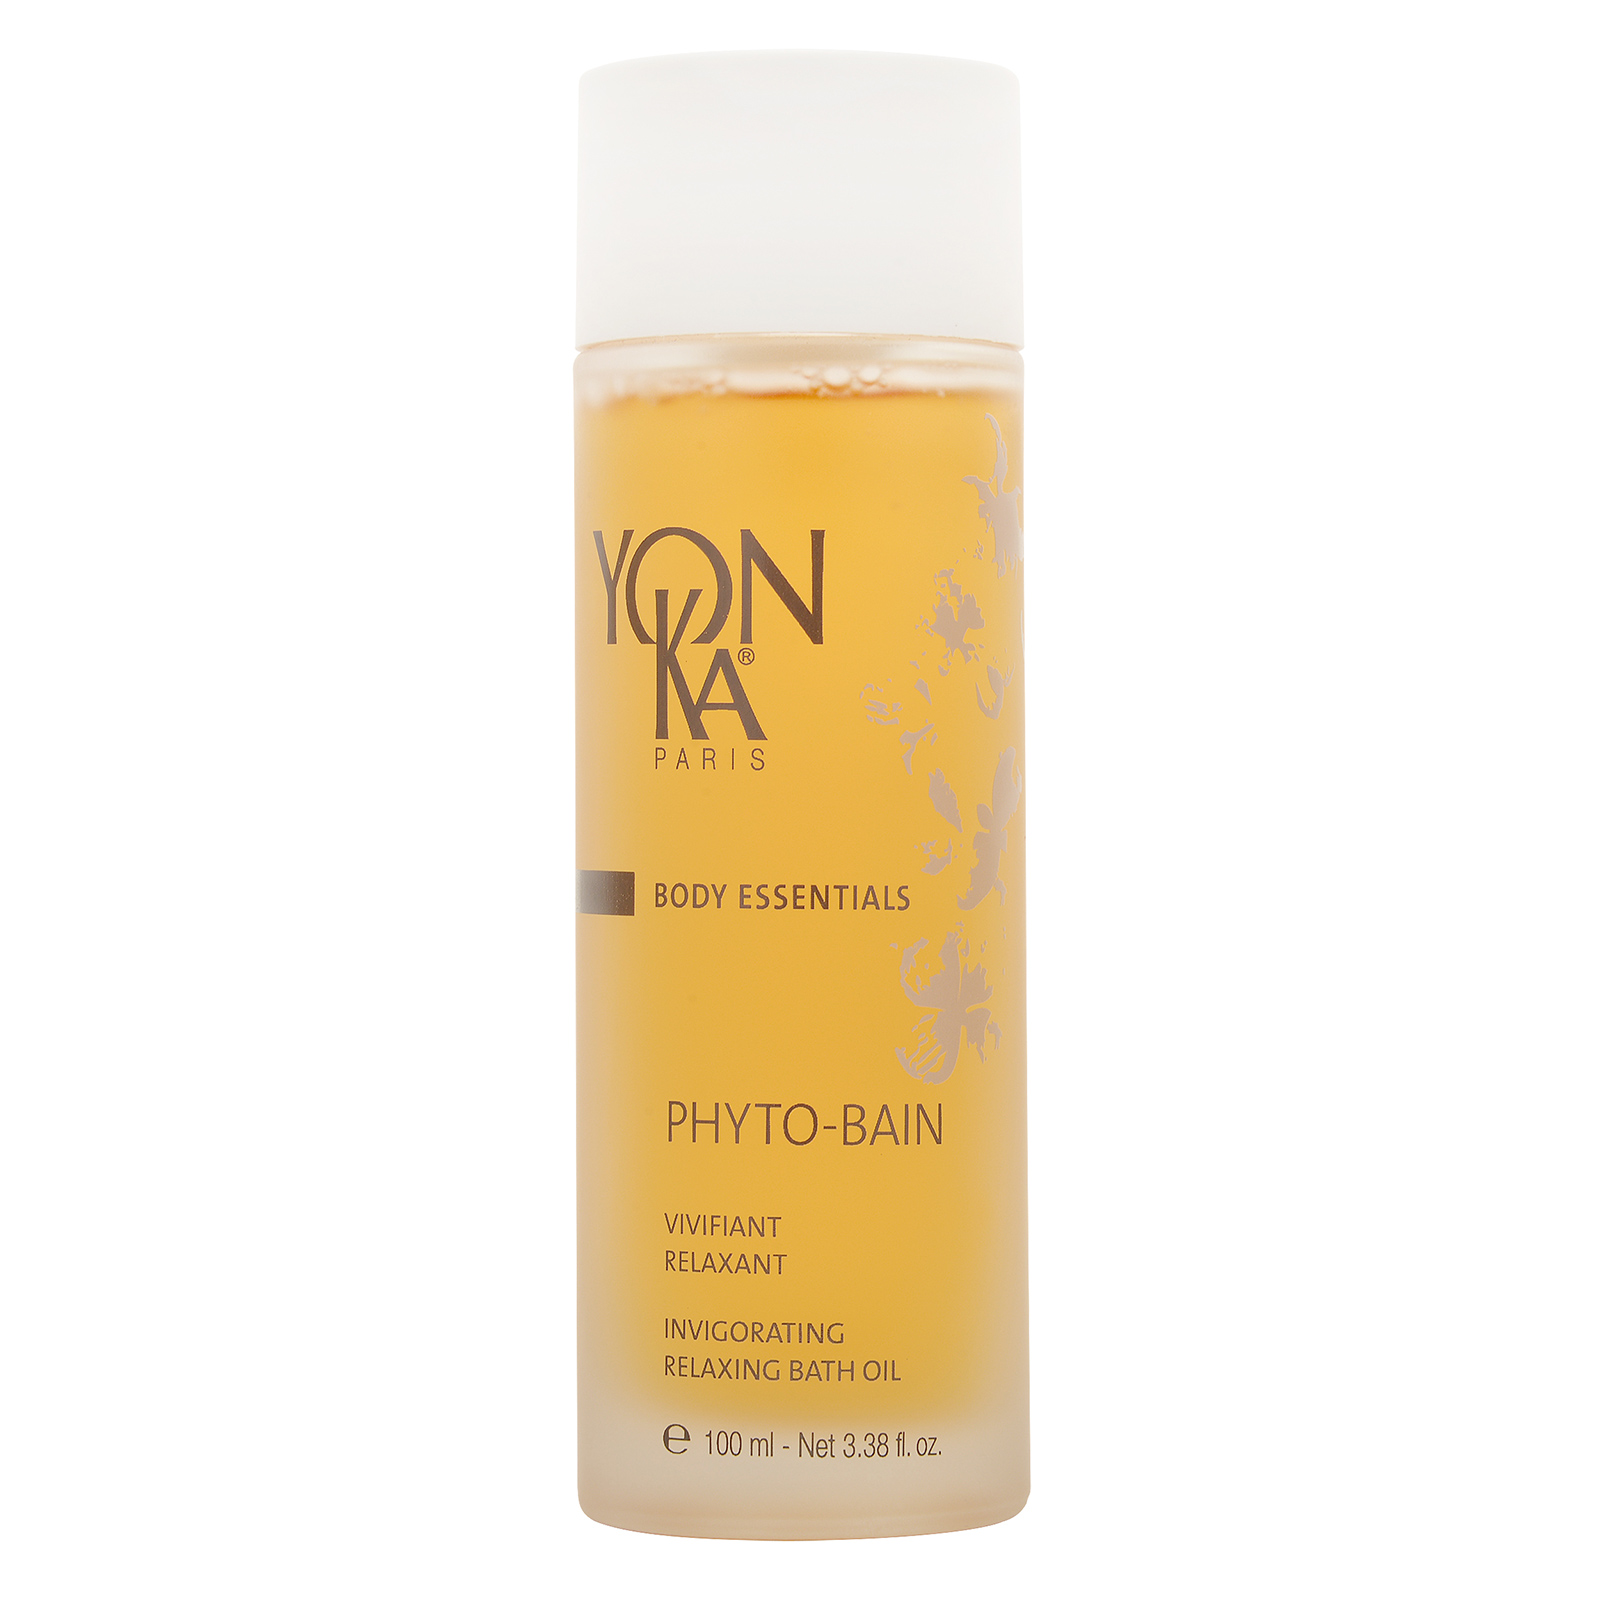 YON-KA Body Essentials Phyto- Bain Invigorating Relaxing Bath Oil  3.38oz, 100ml